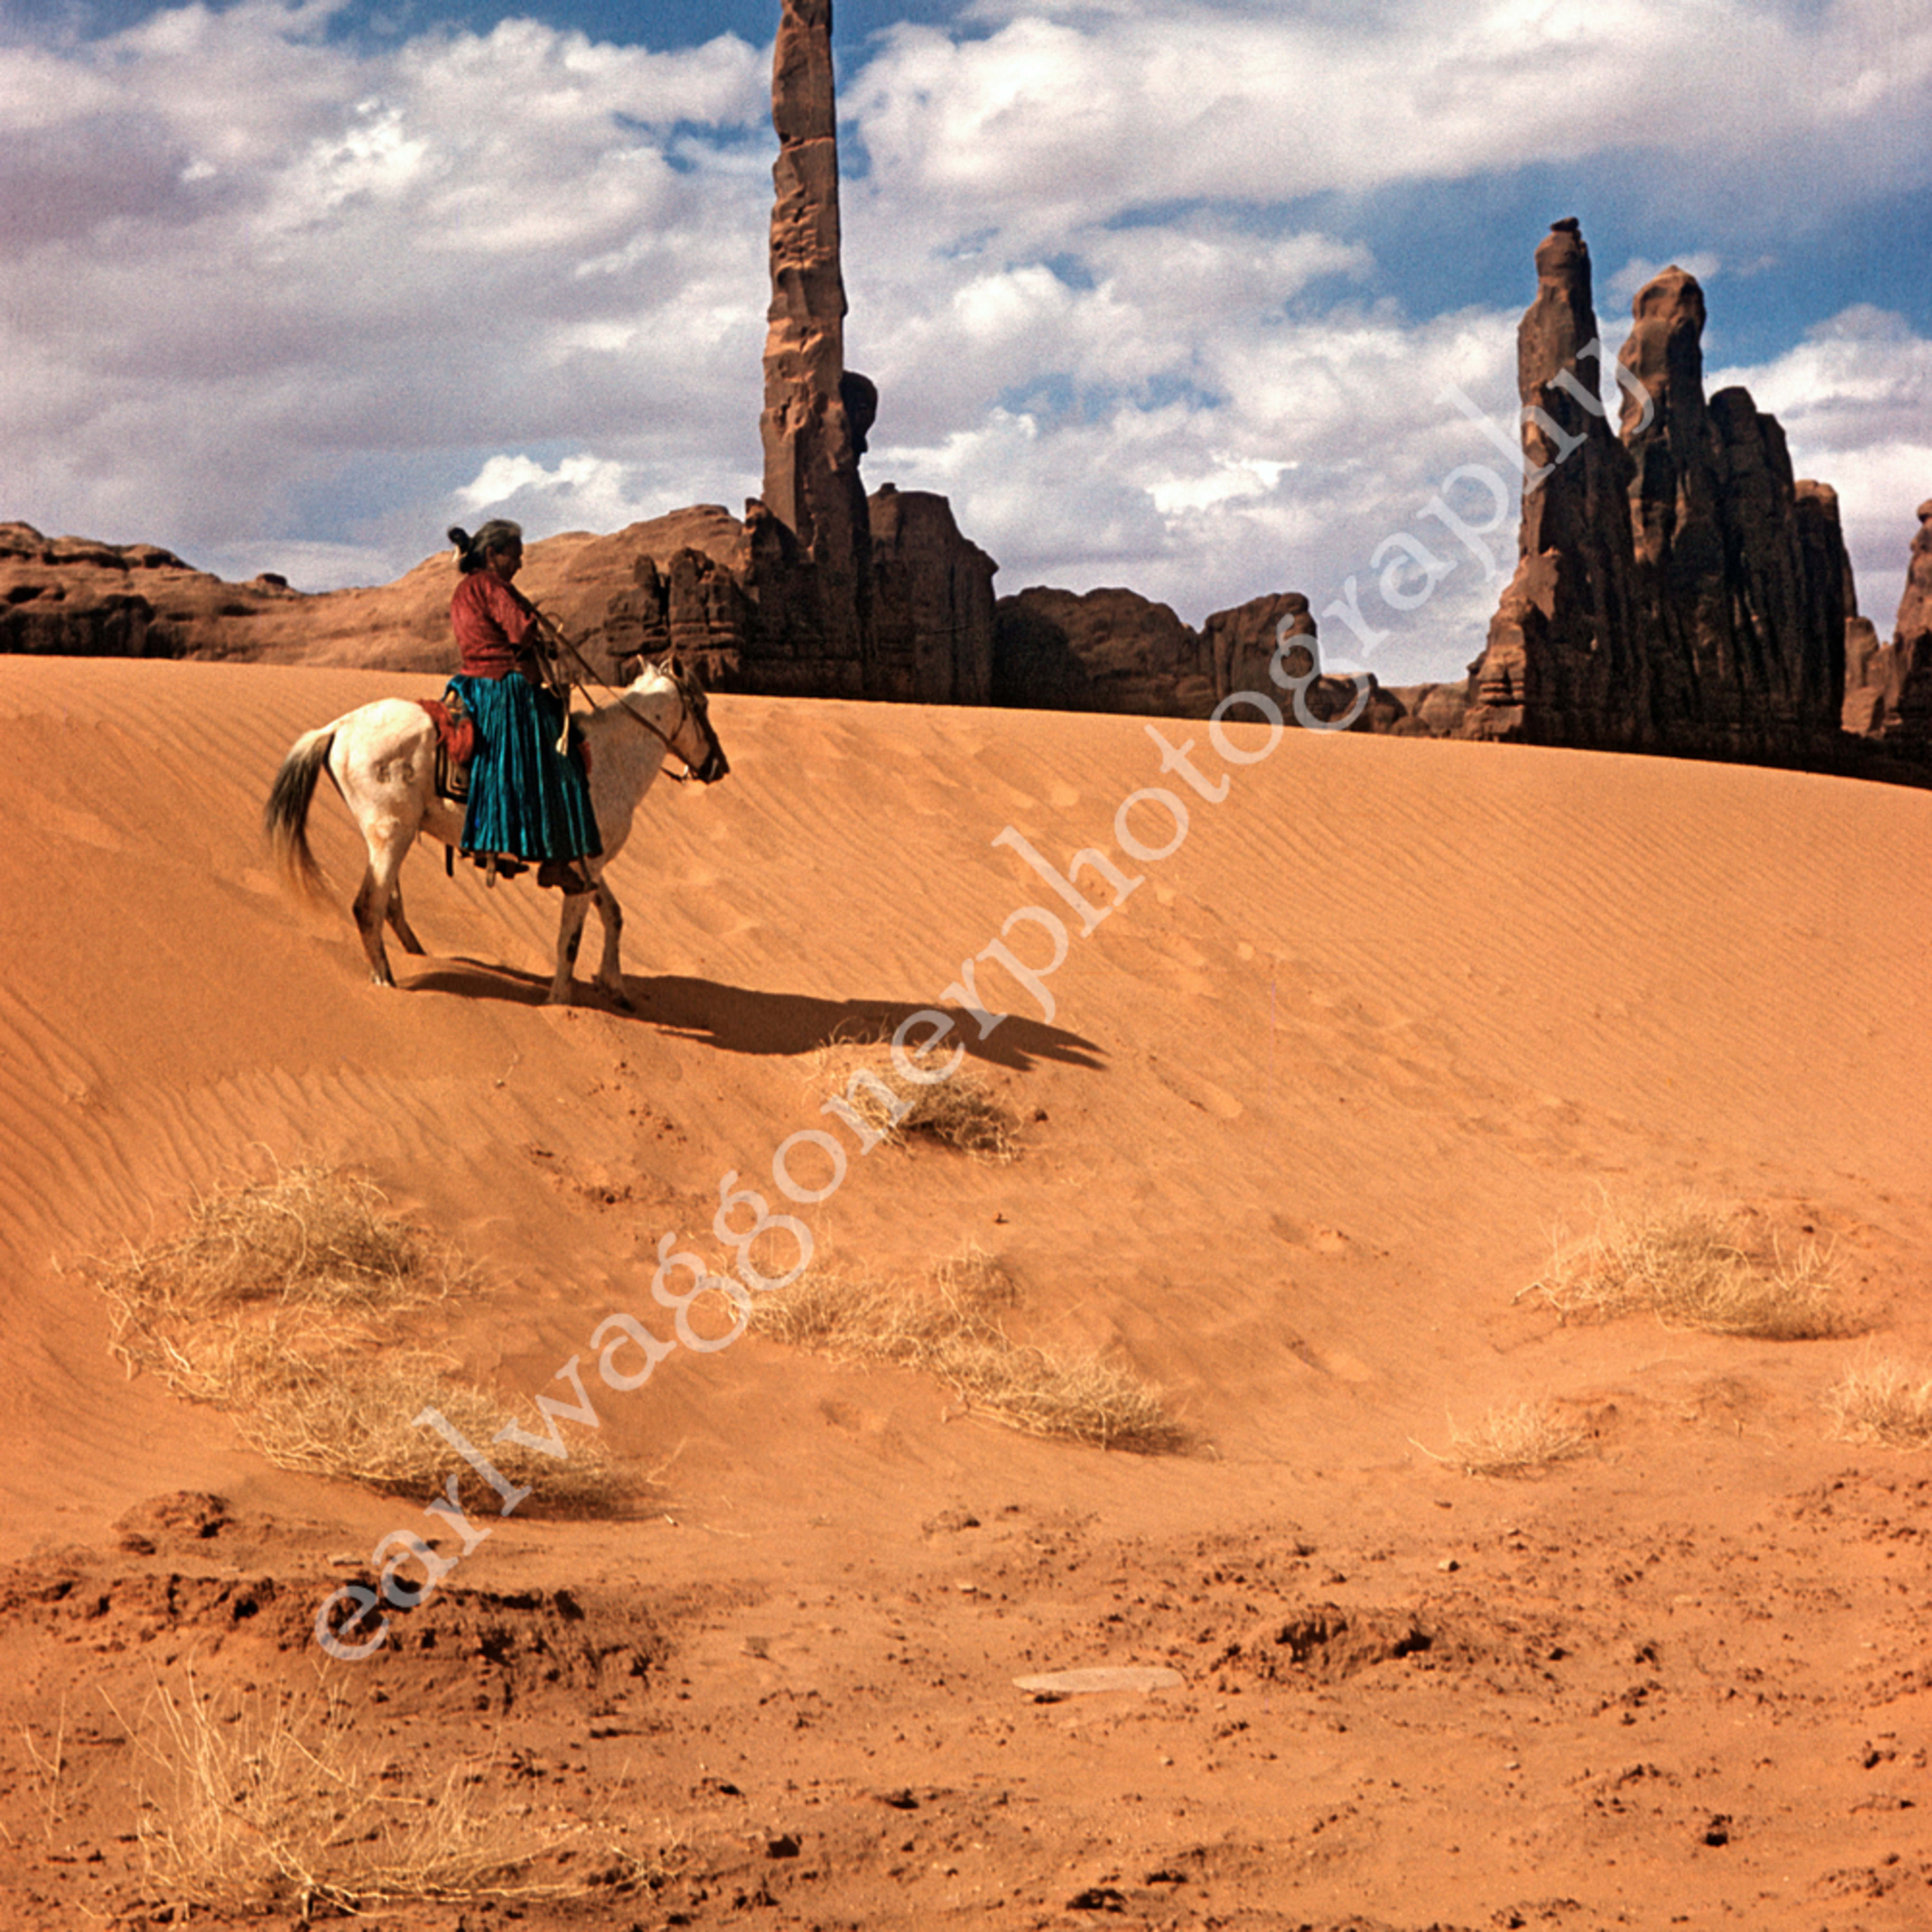 Ucb 124 happy cly on horseback copy gweajf